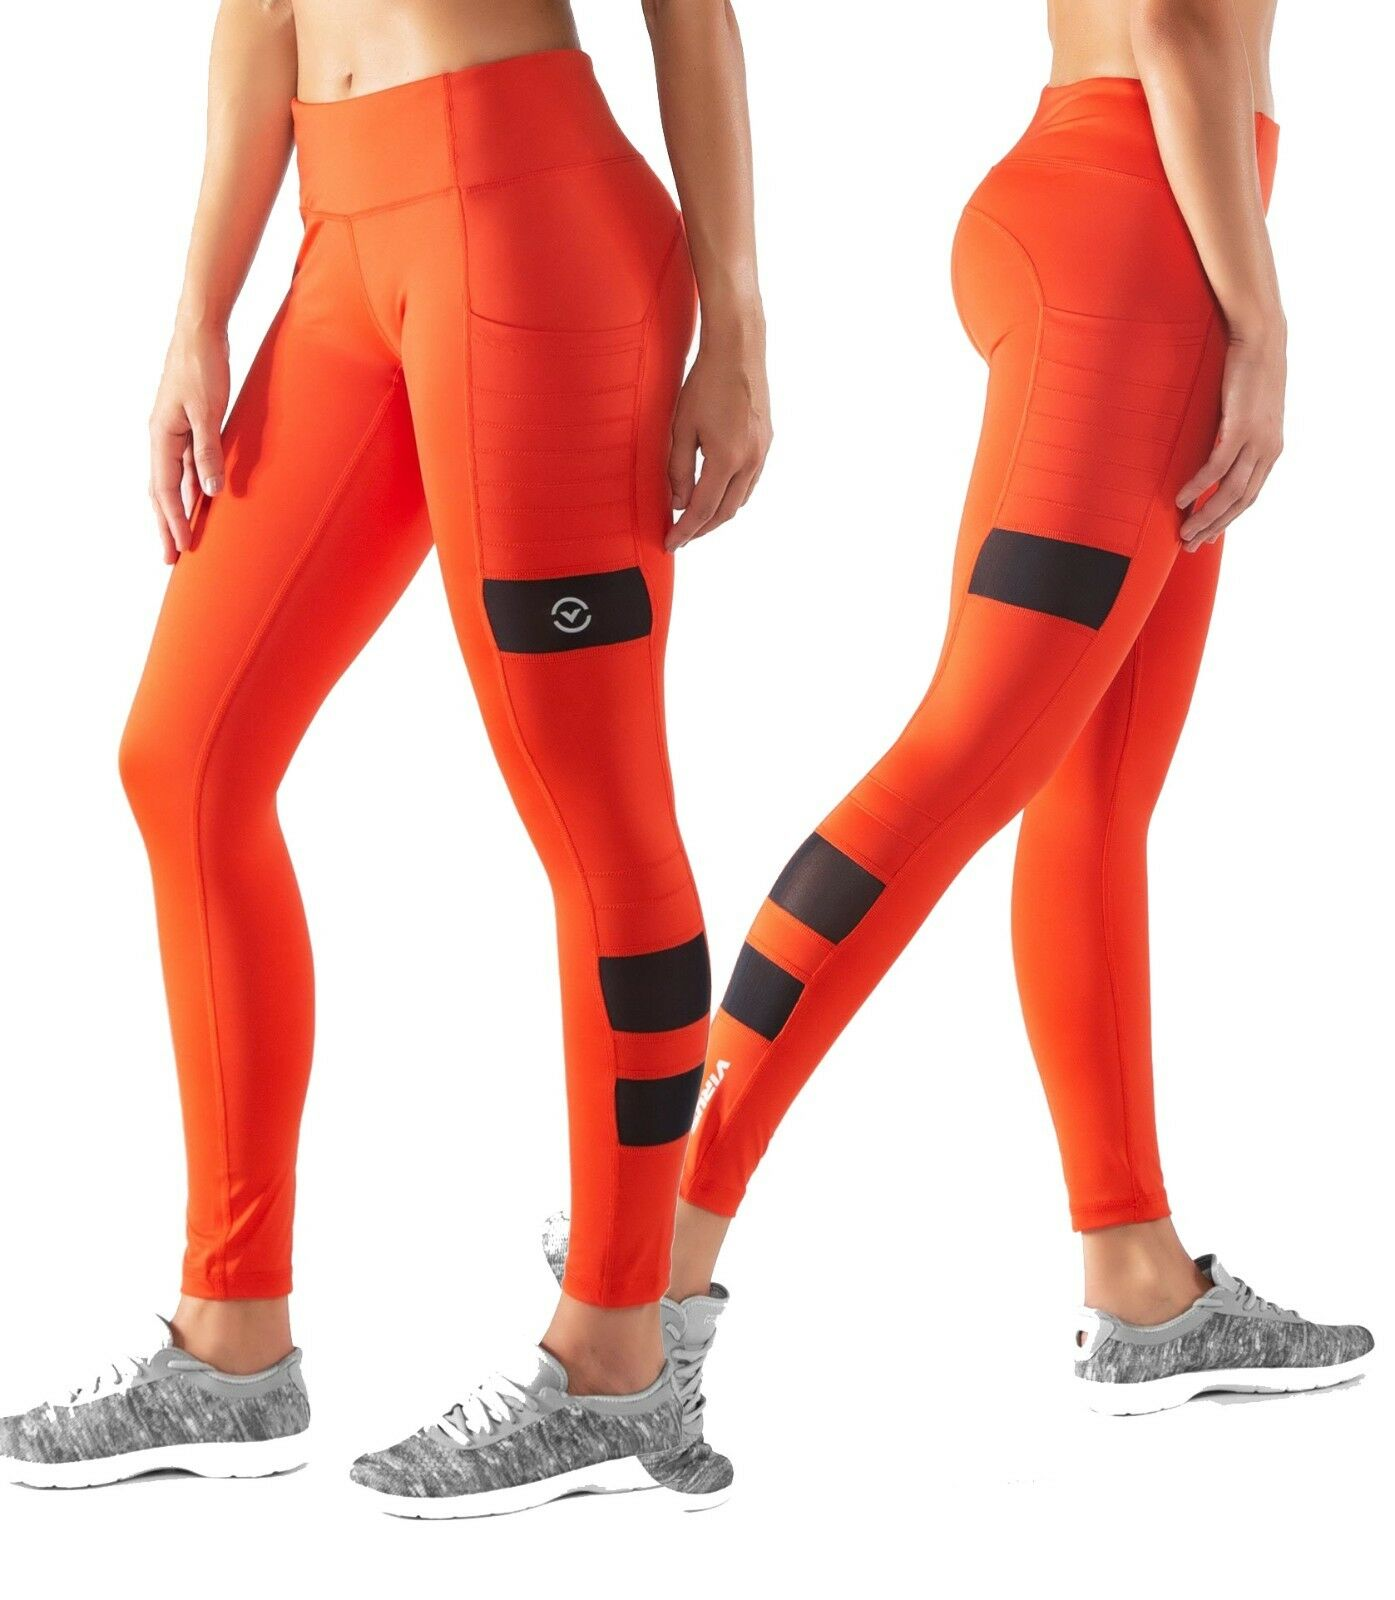 Virus Damenschuhe ECO40 STAY COOL ZEPU MESH PANT - Blood Orange Crossfit Yoga